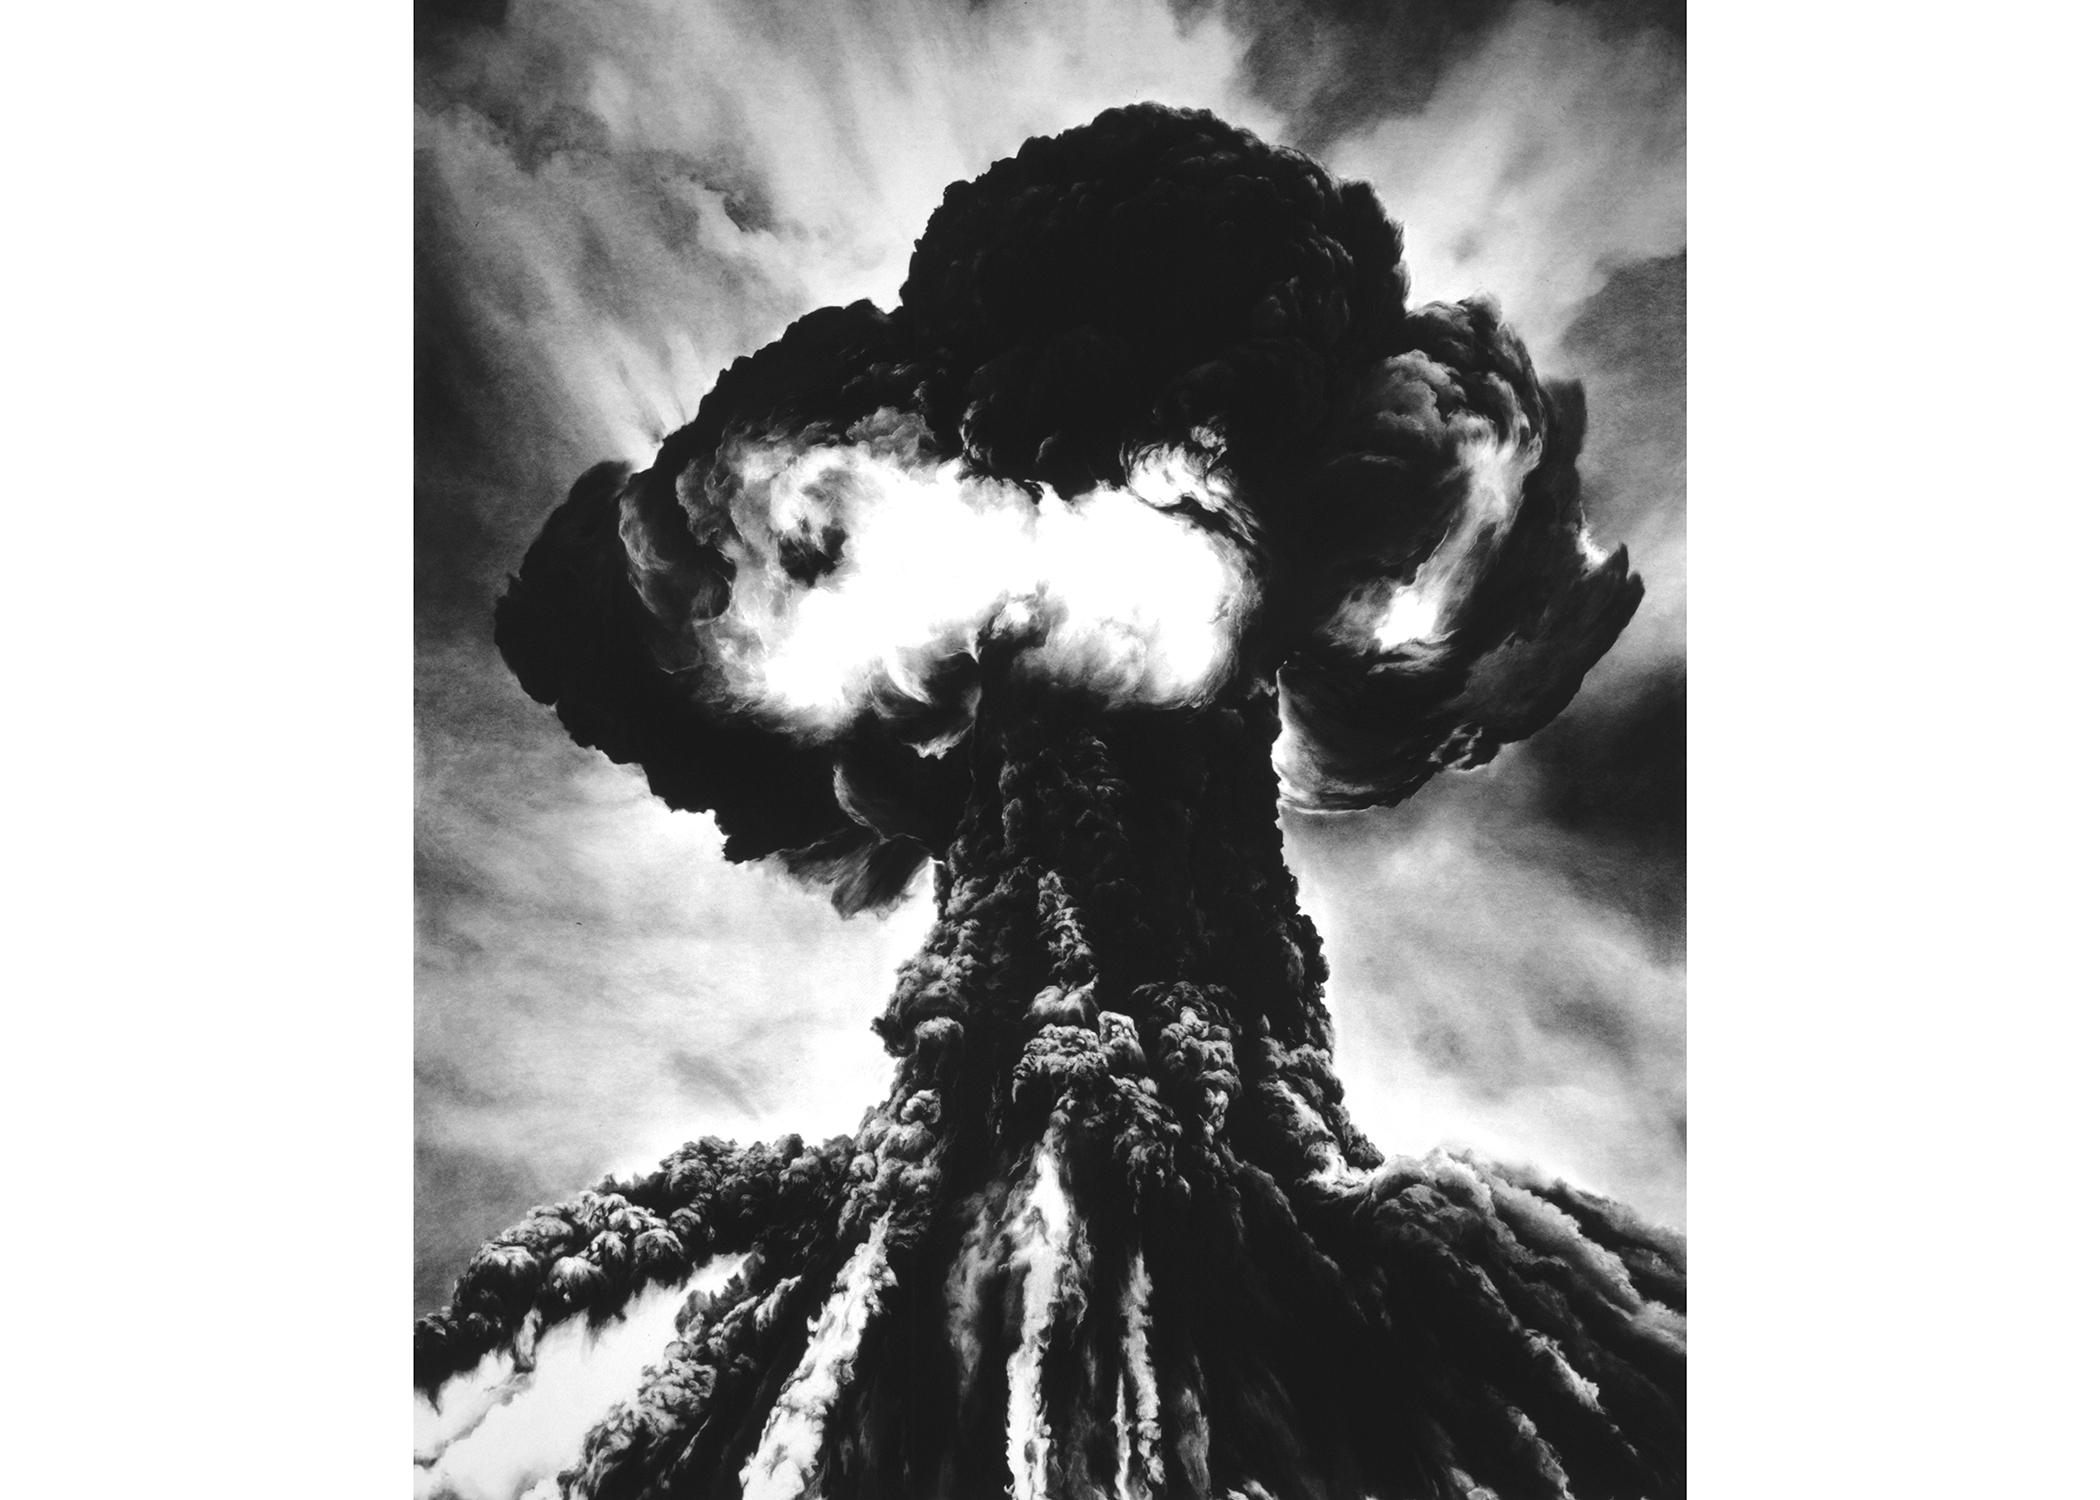 Image Above: ©Robert Longo, 'Untitled (Russian Bomb / Semipalatinsk), 2003 / Courtesy of the Artist